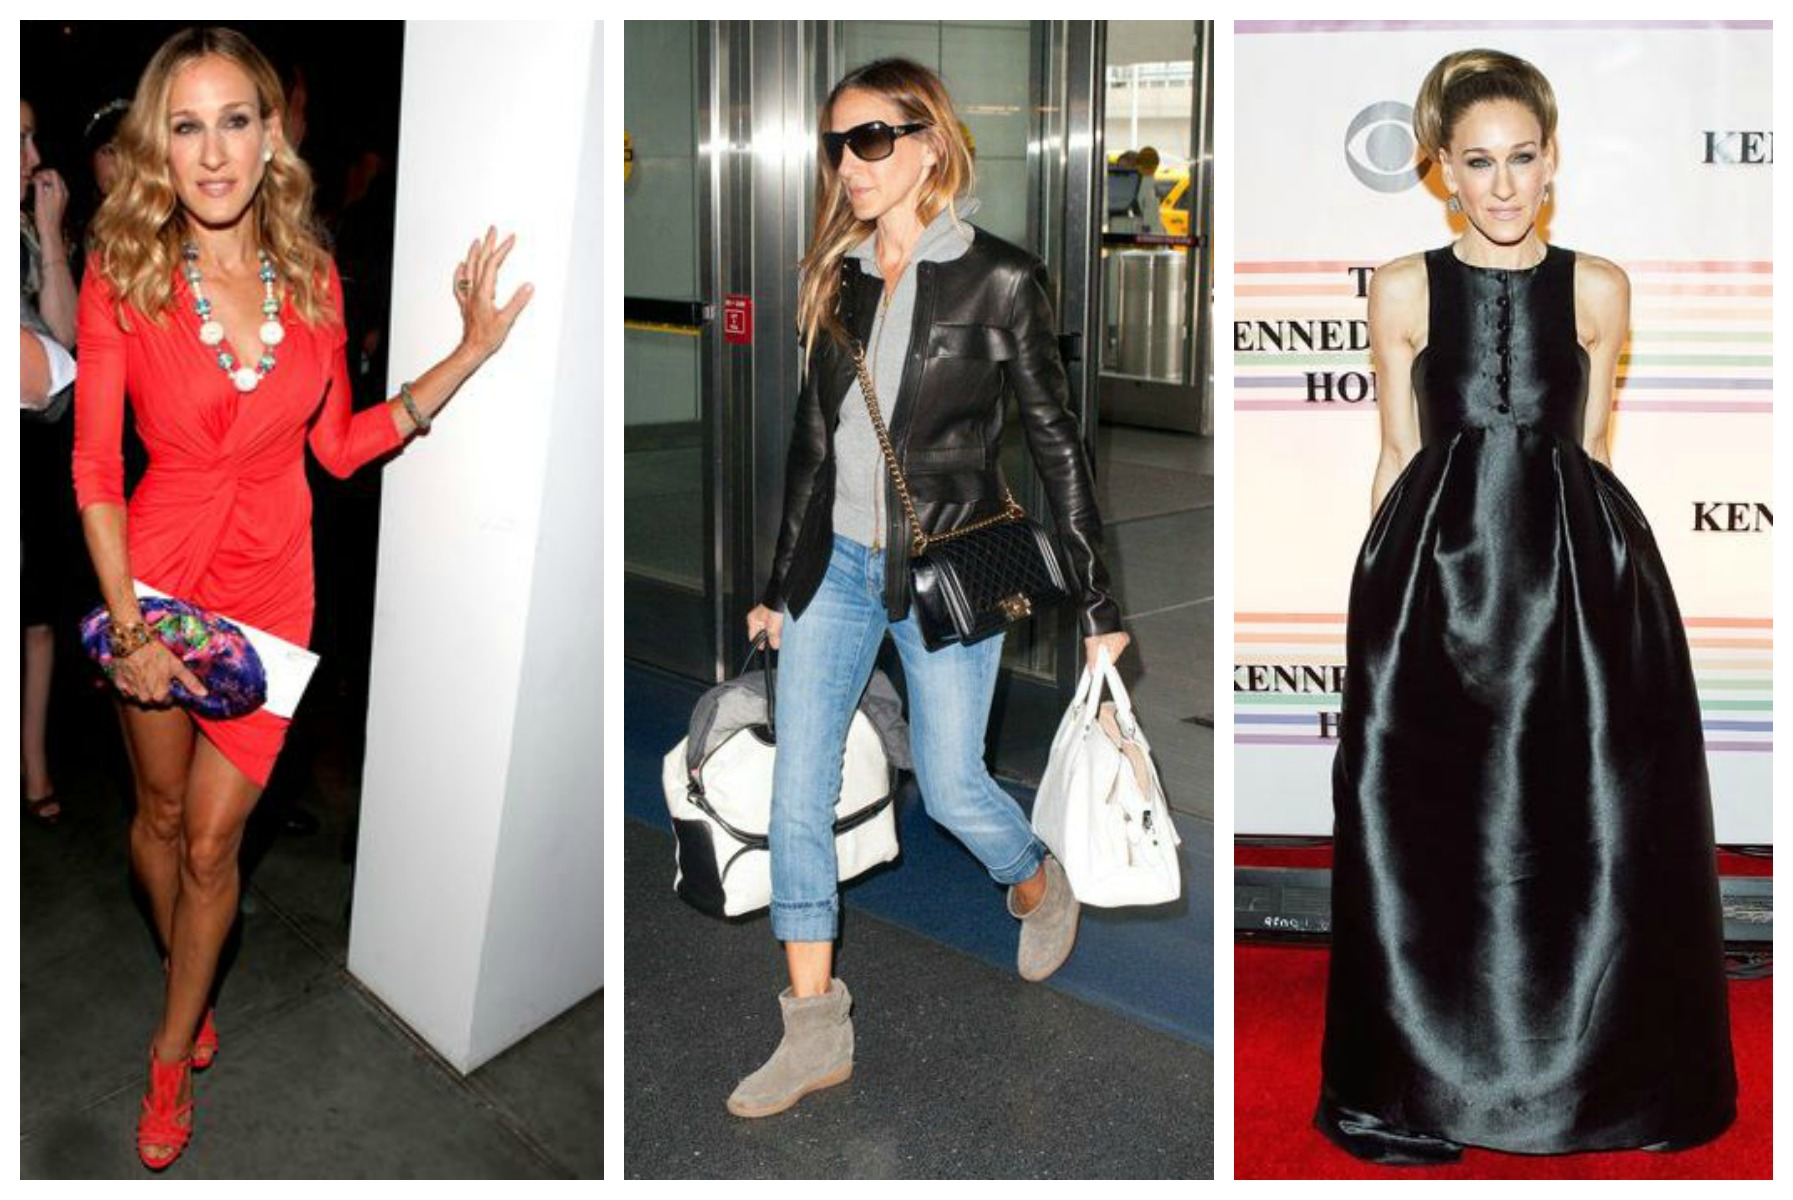 vith.es consultoria de moda estilo outfit sarah jessica parker style looks sex and the city antonio pozuelo (3)